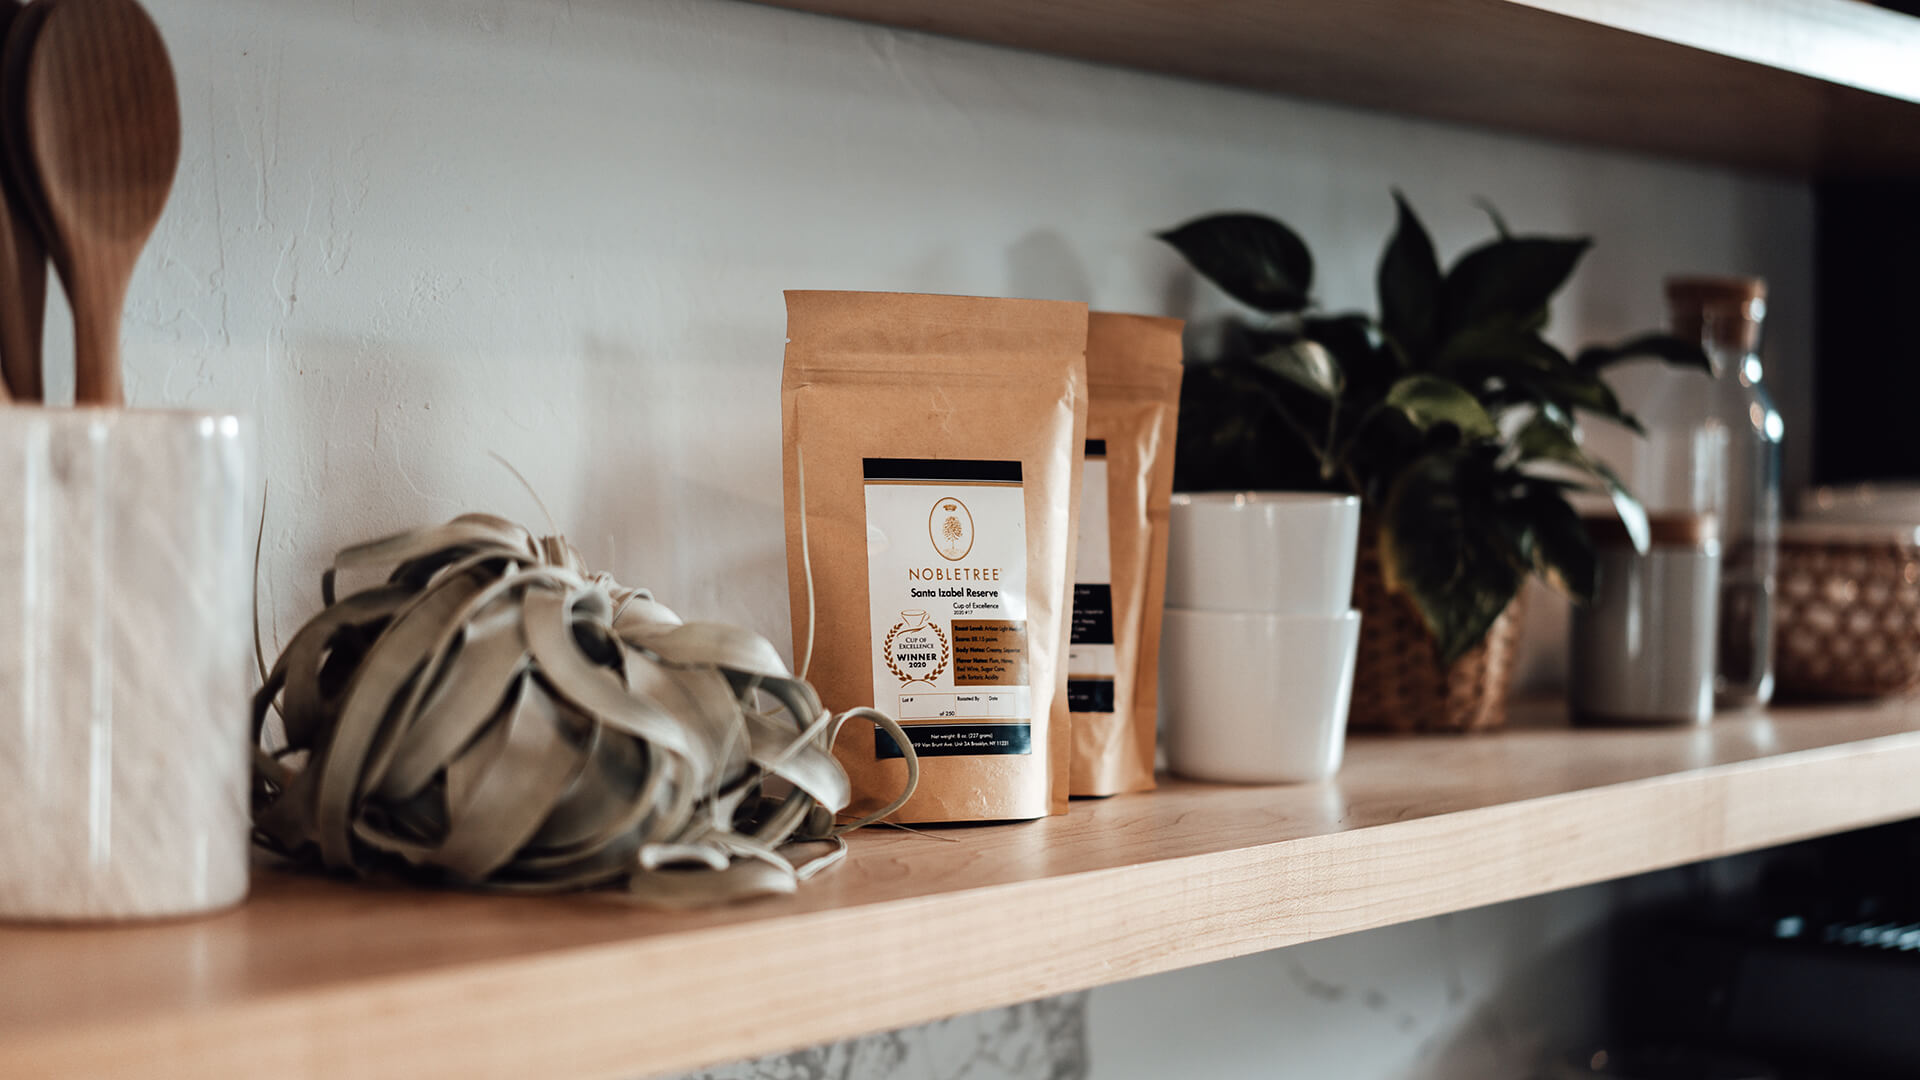 Nobletree Coffee Bags on Shelf